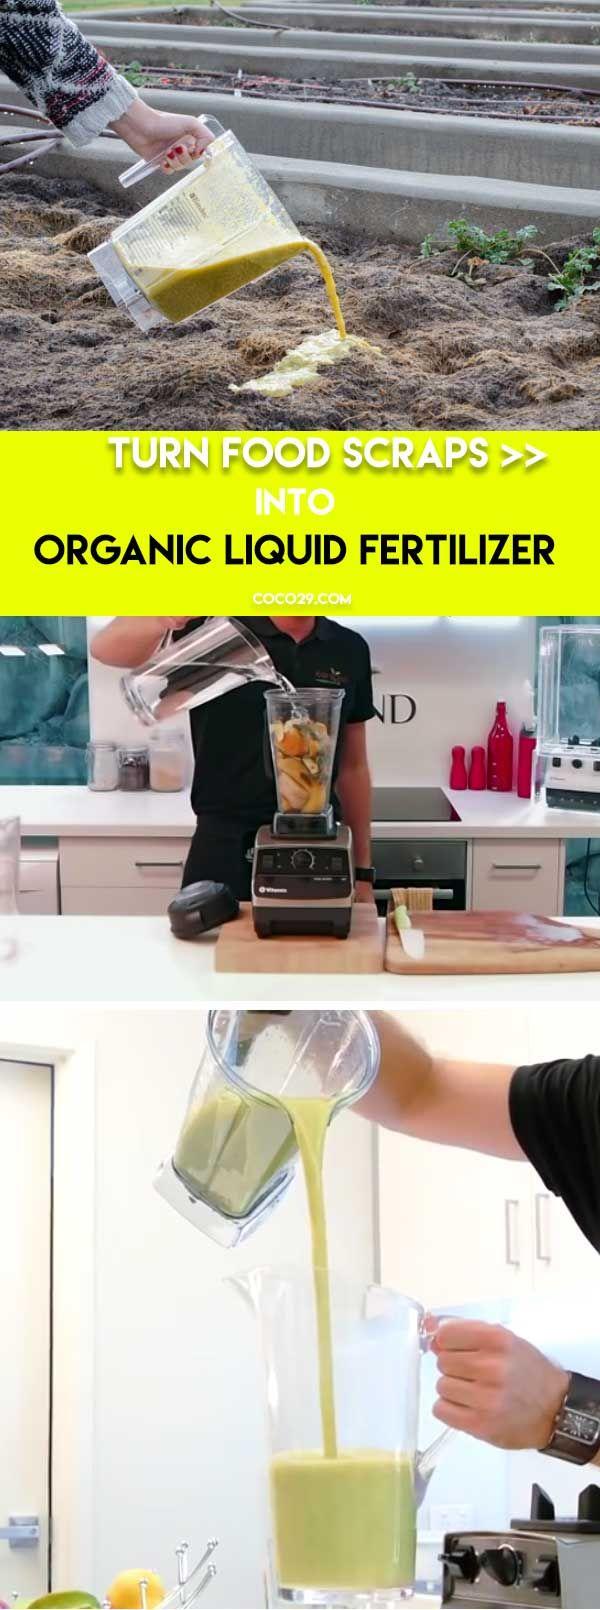 Liquid Organic Fertilizer | Genius Garden Hacks for Beginners | DIY Garden Ideas on a Budget